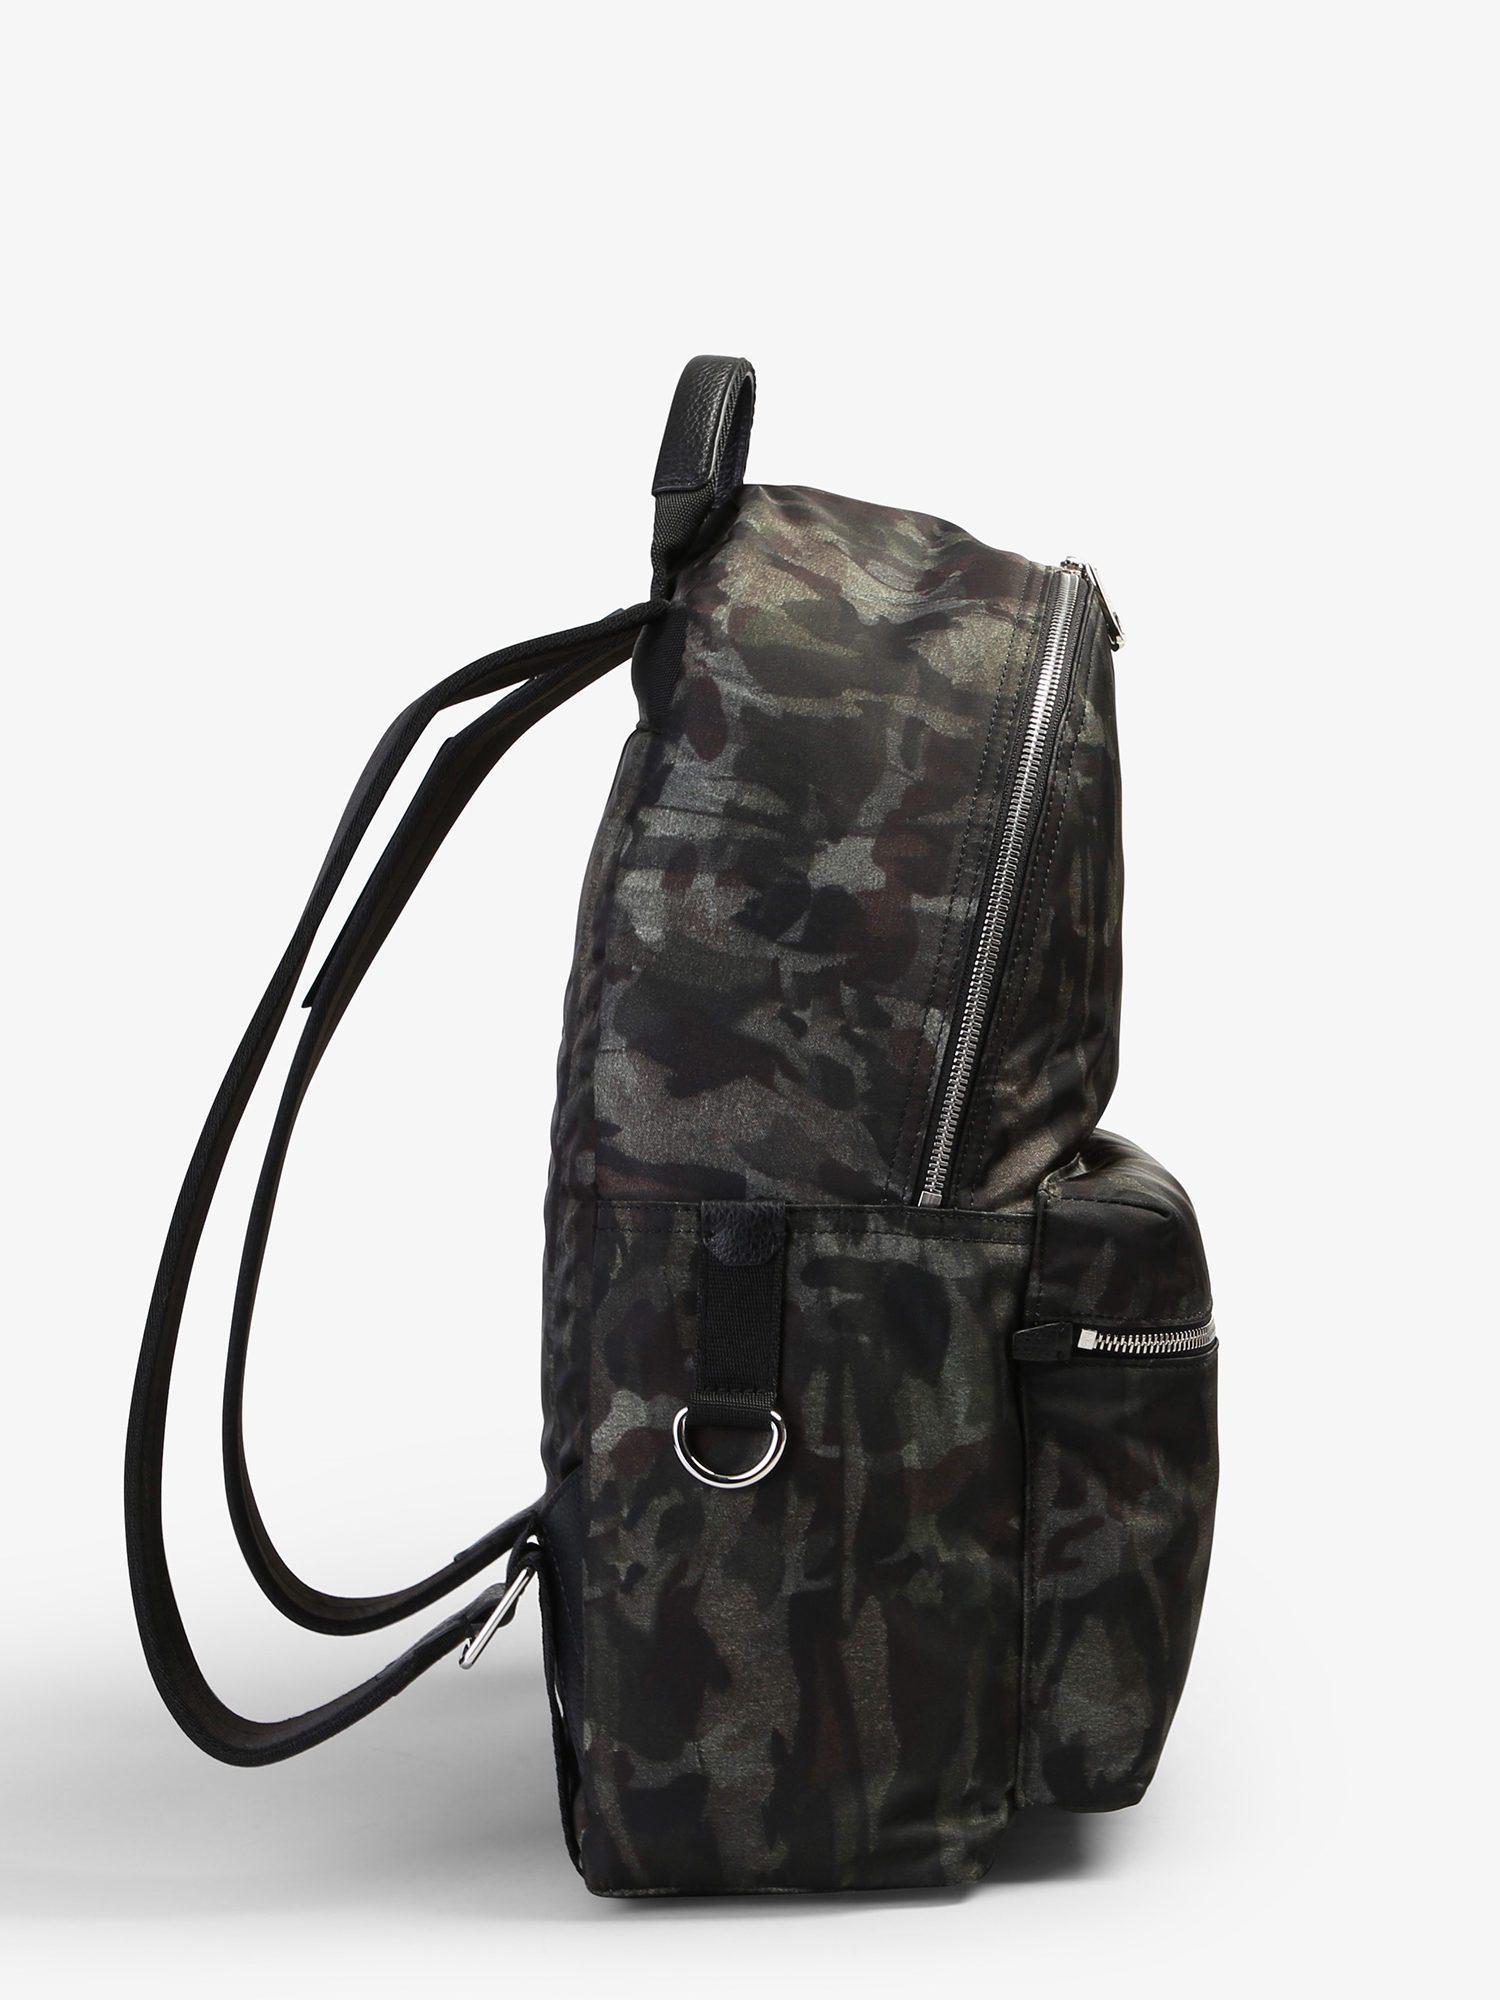 Dolce   Gabbana Camouflage Pattern Nylon Backpack in Black for Men - Lyst 2796f0424214d